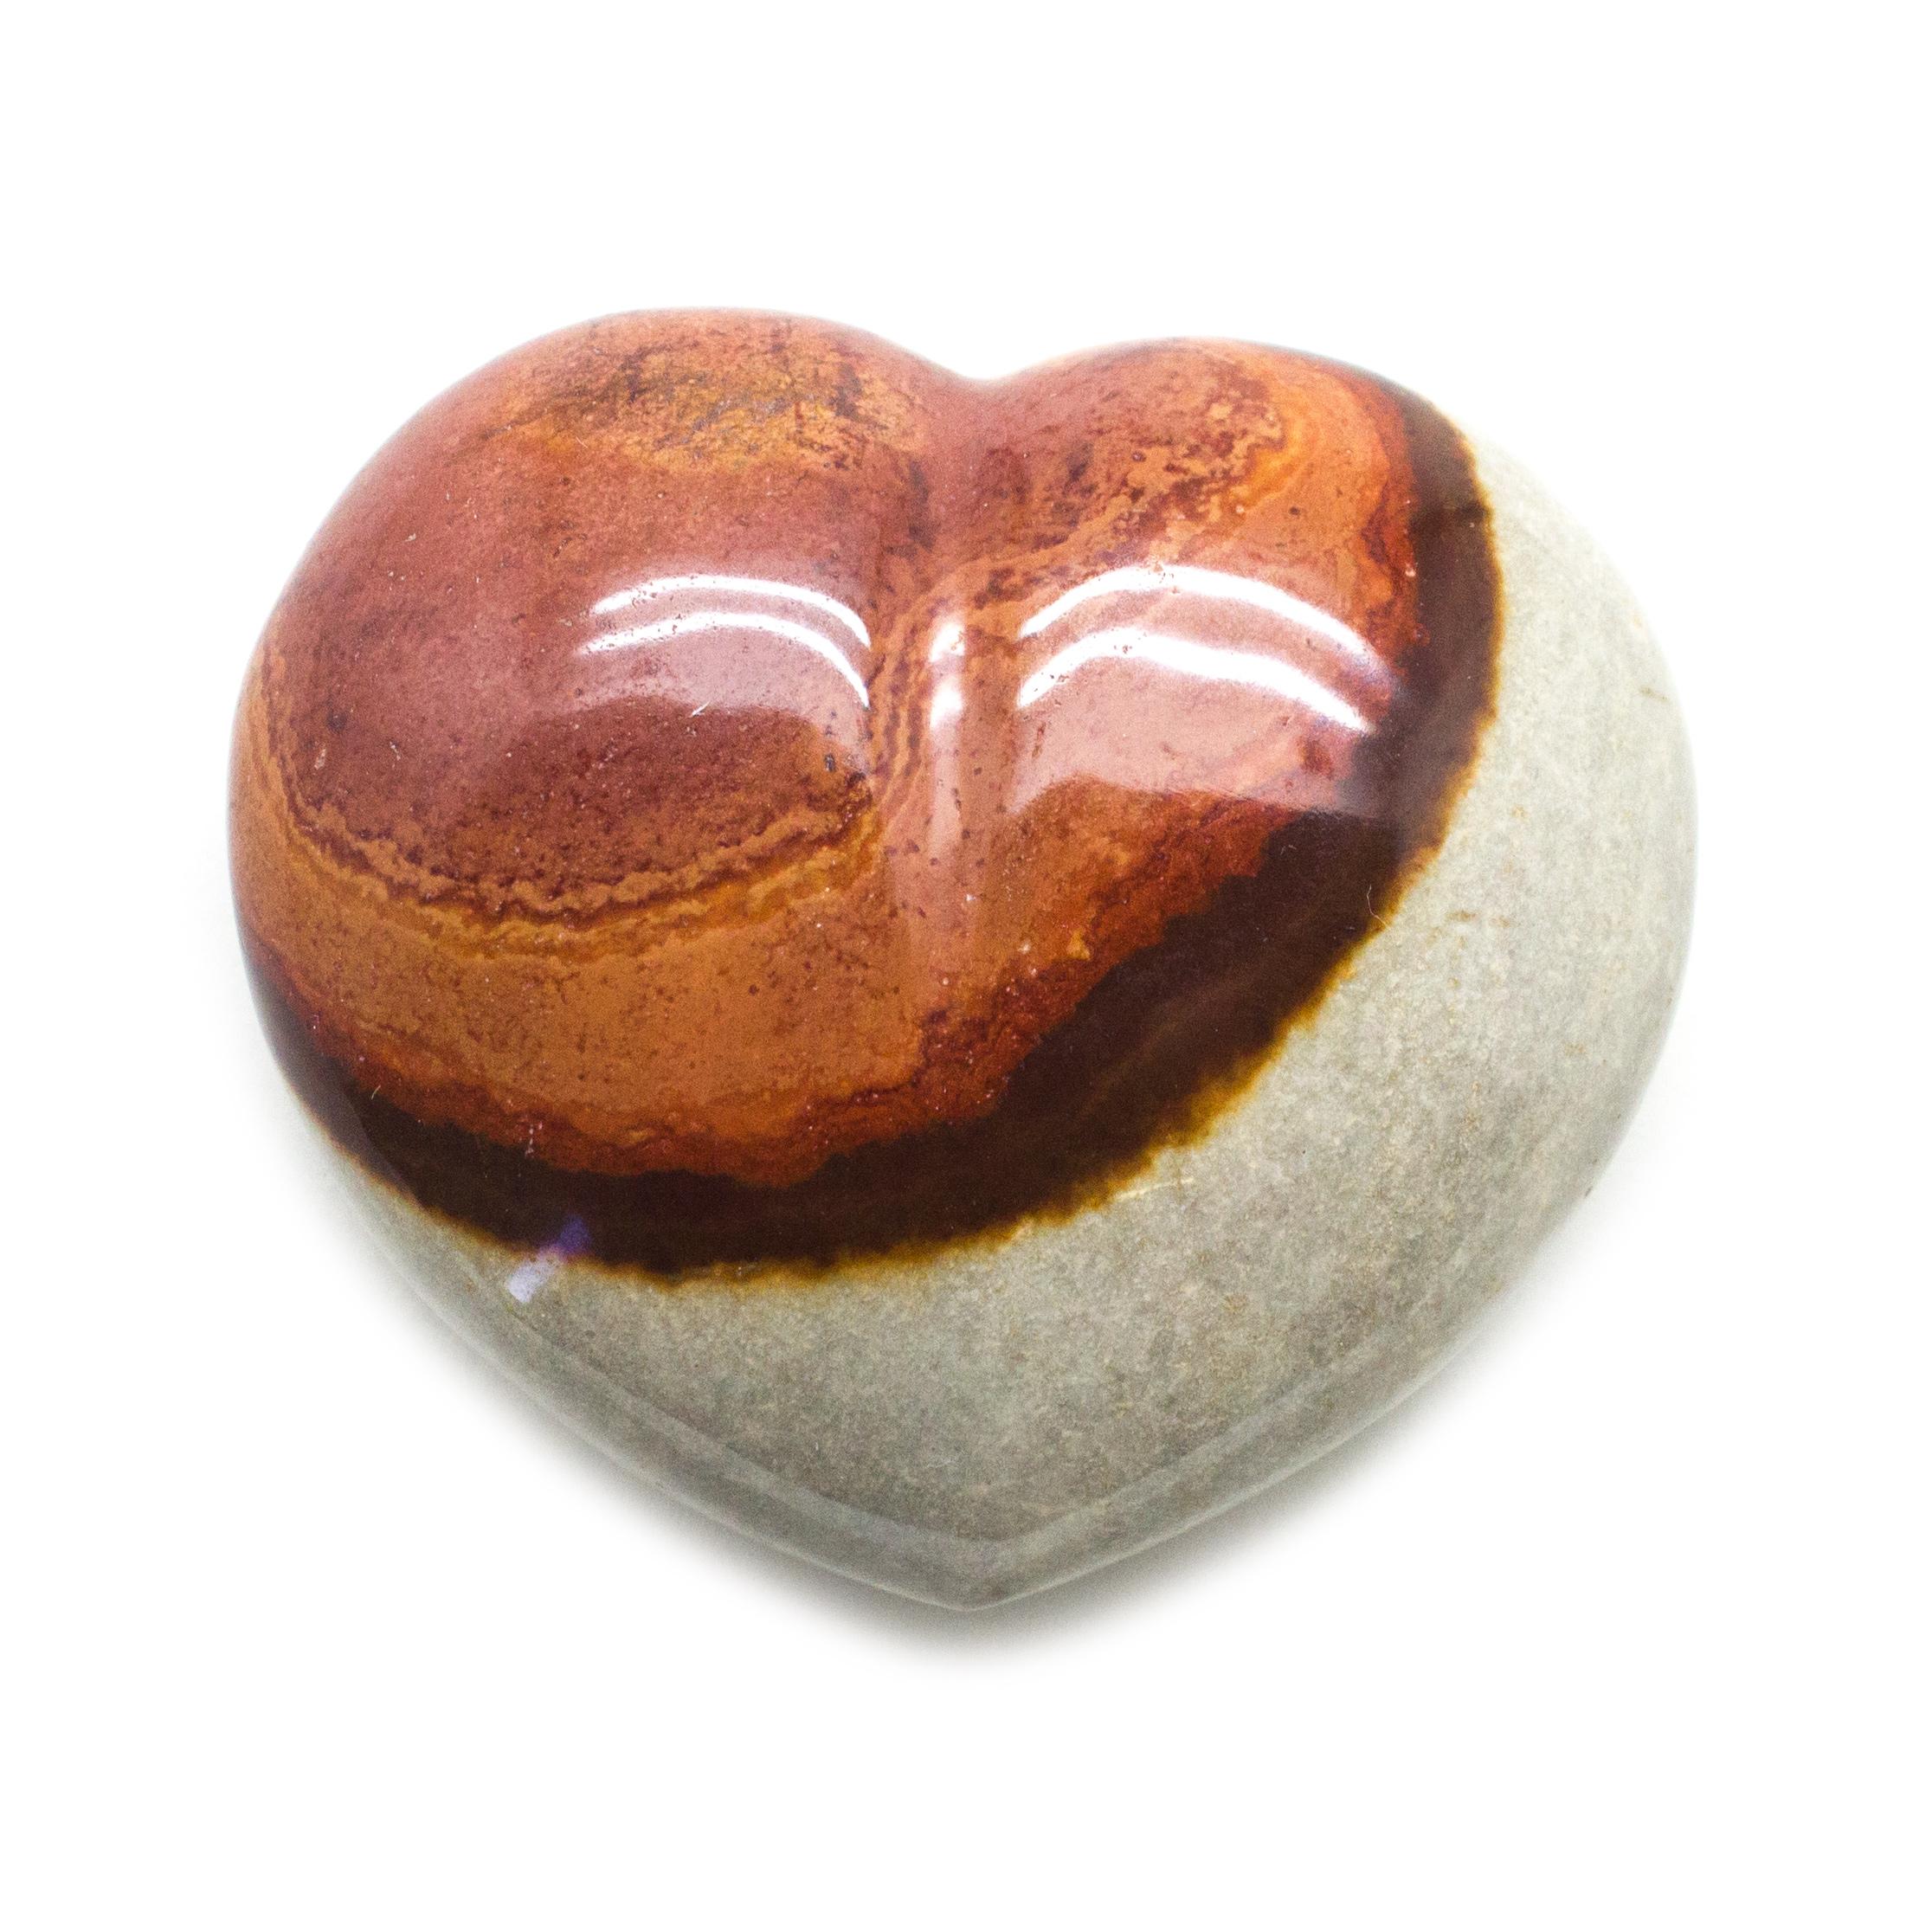 2.3 Polychrome Jasper Heart  Desert Jasper  Blue  Pink  Gemstone Crystal Heart #12